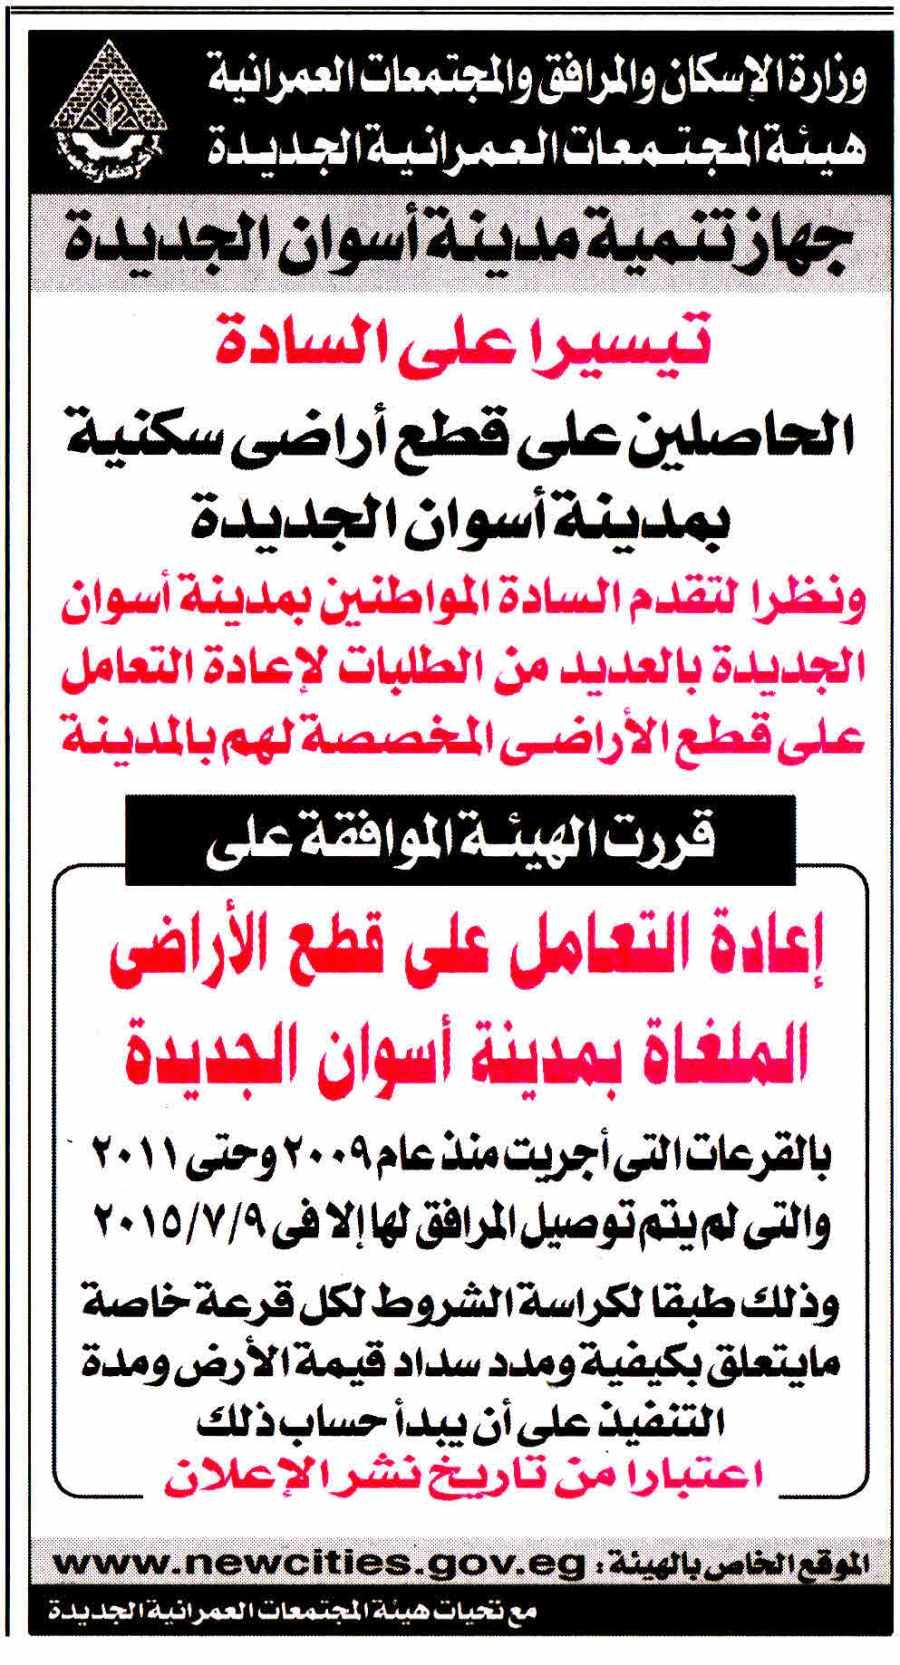 Al Ahram 26 Dec P.3.jpg